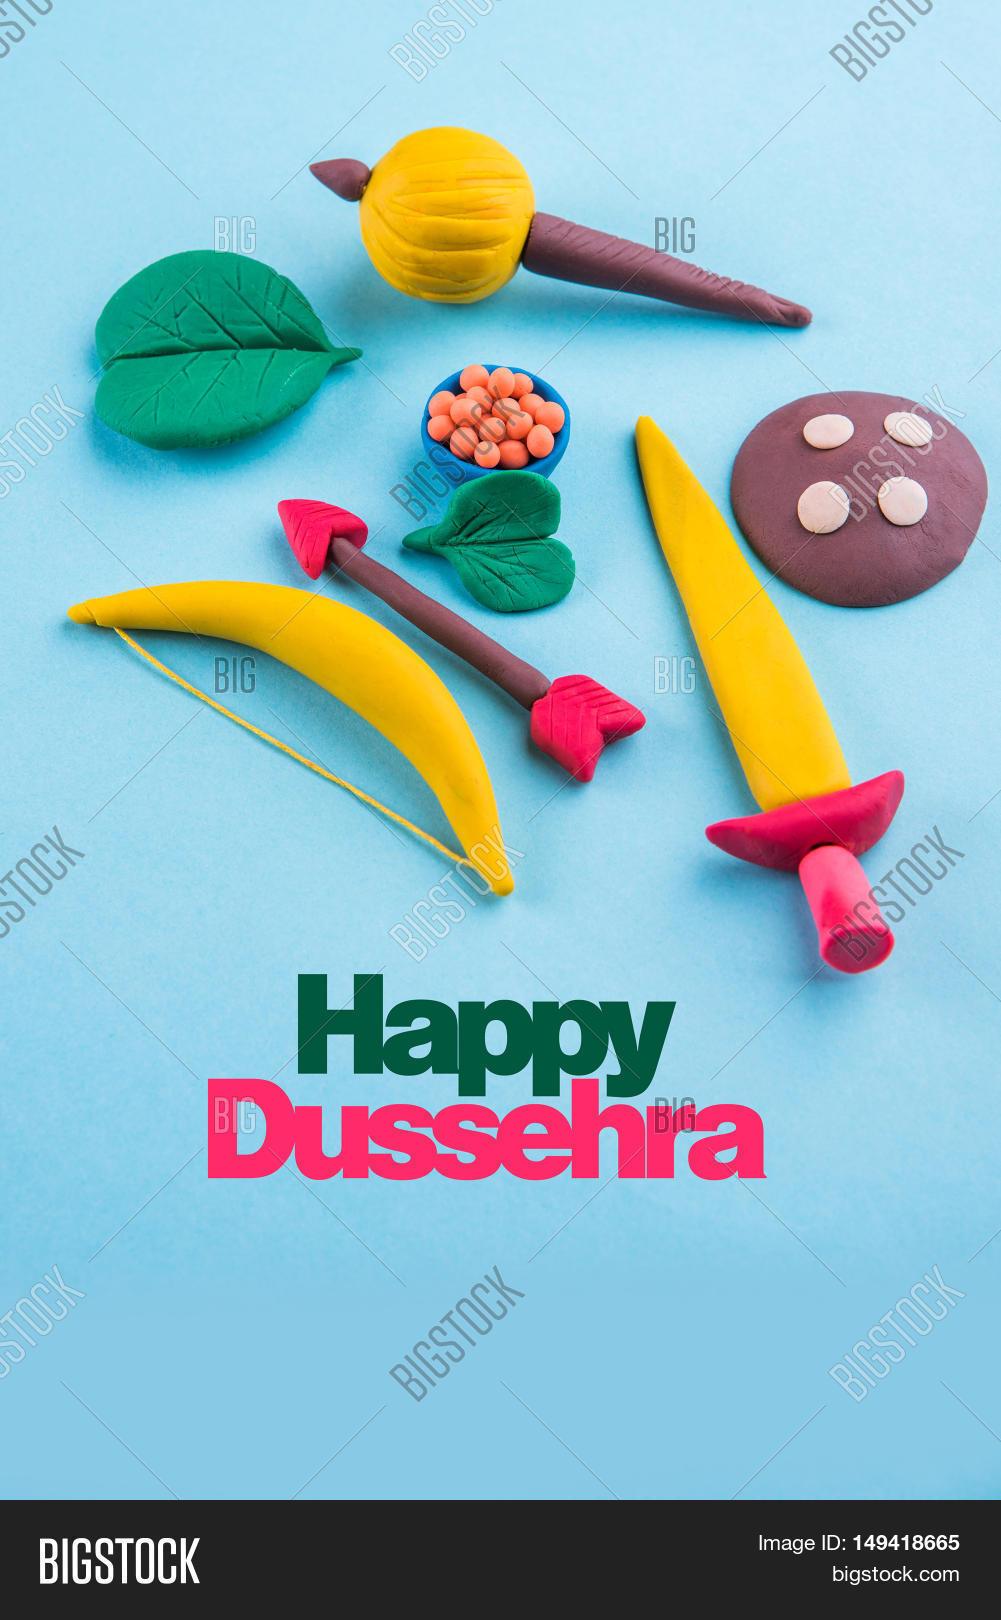 Happy Dussehra Image Photo Free Trial Bigstock